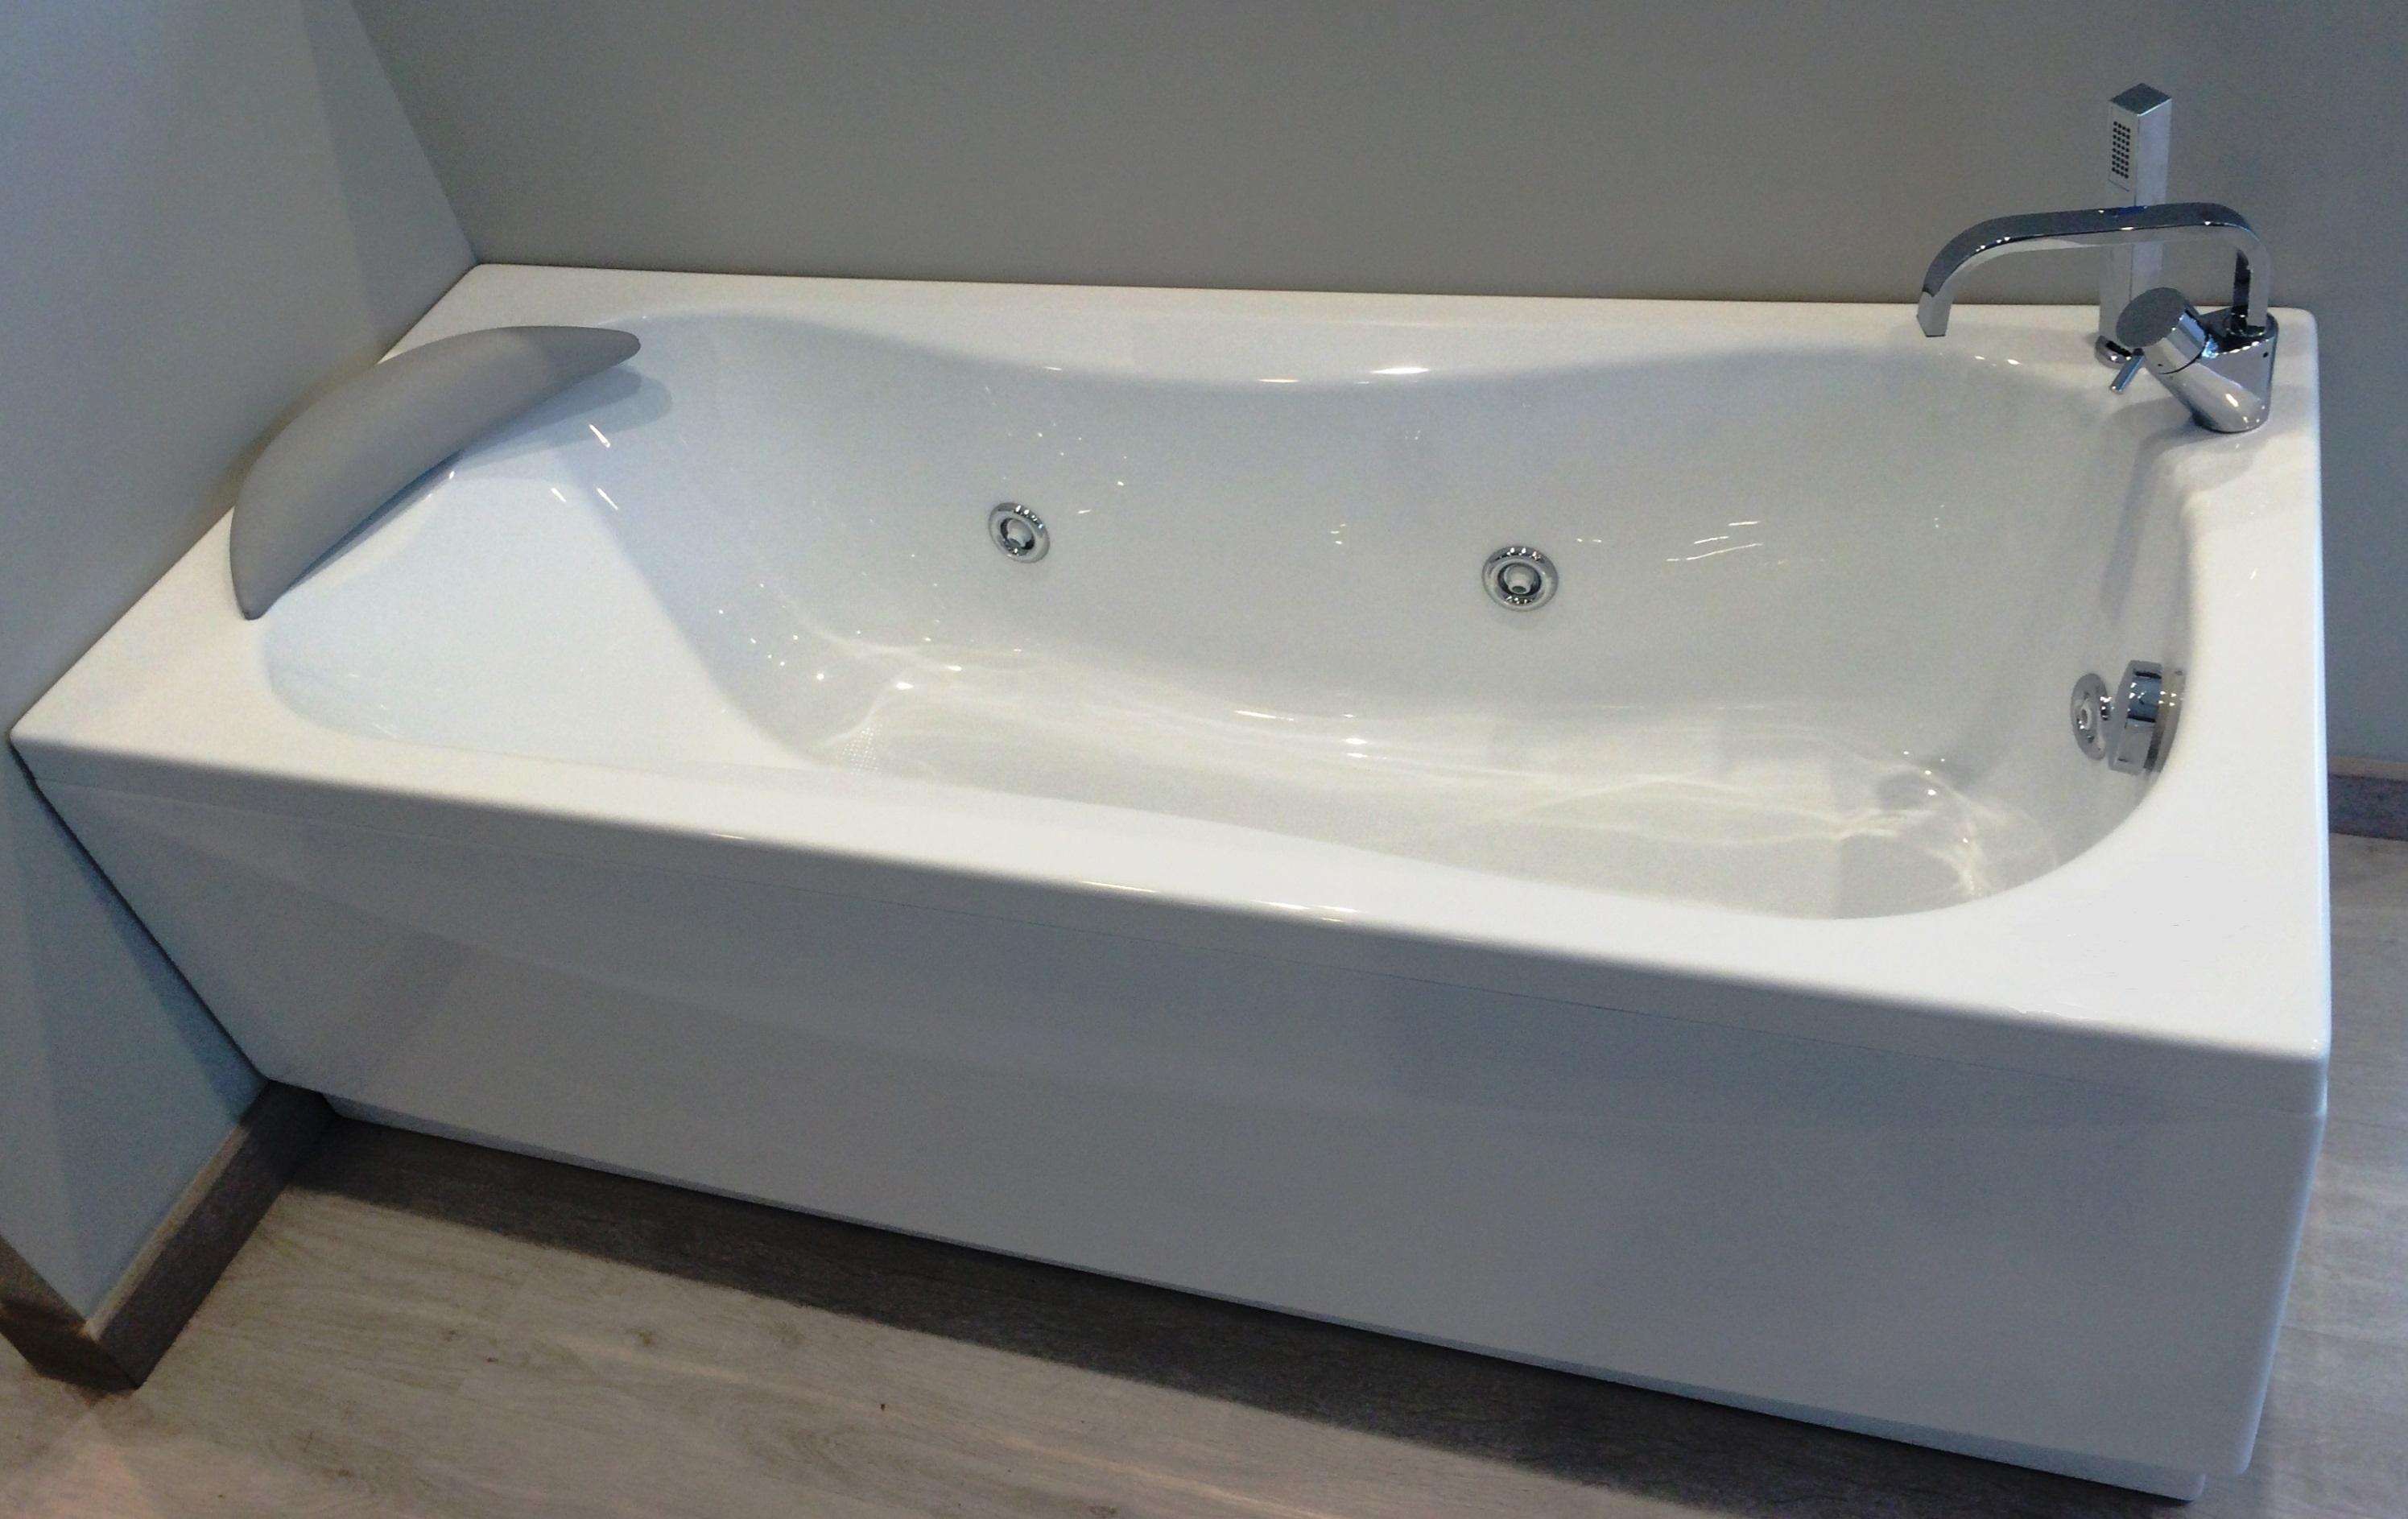 Vasca Da Bagno Incasso Novellini : Novellini calipso vasca idromassaggio g vestire la casa